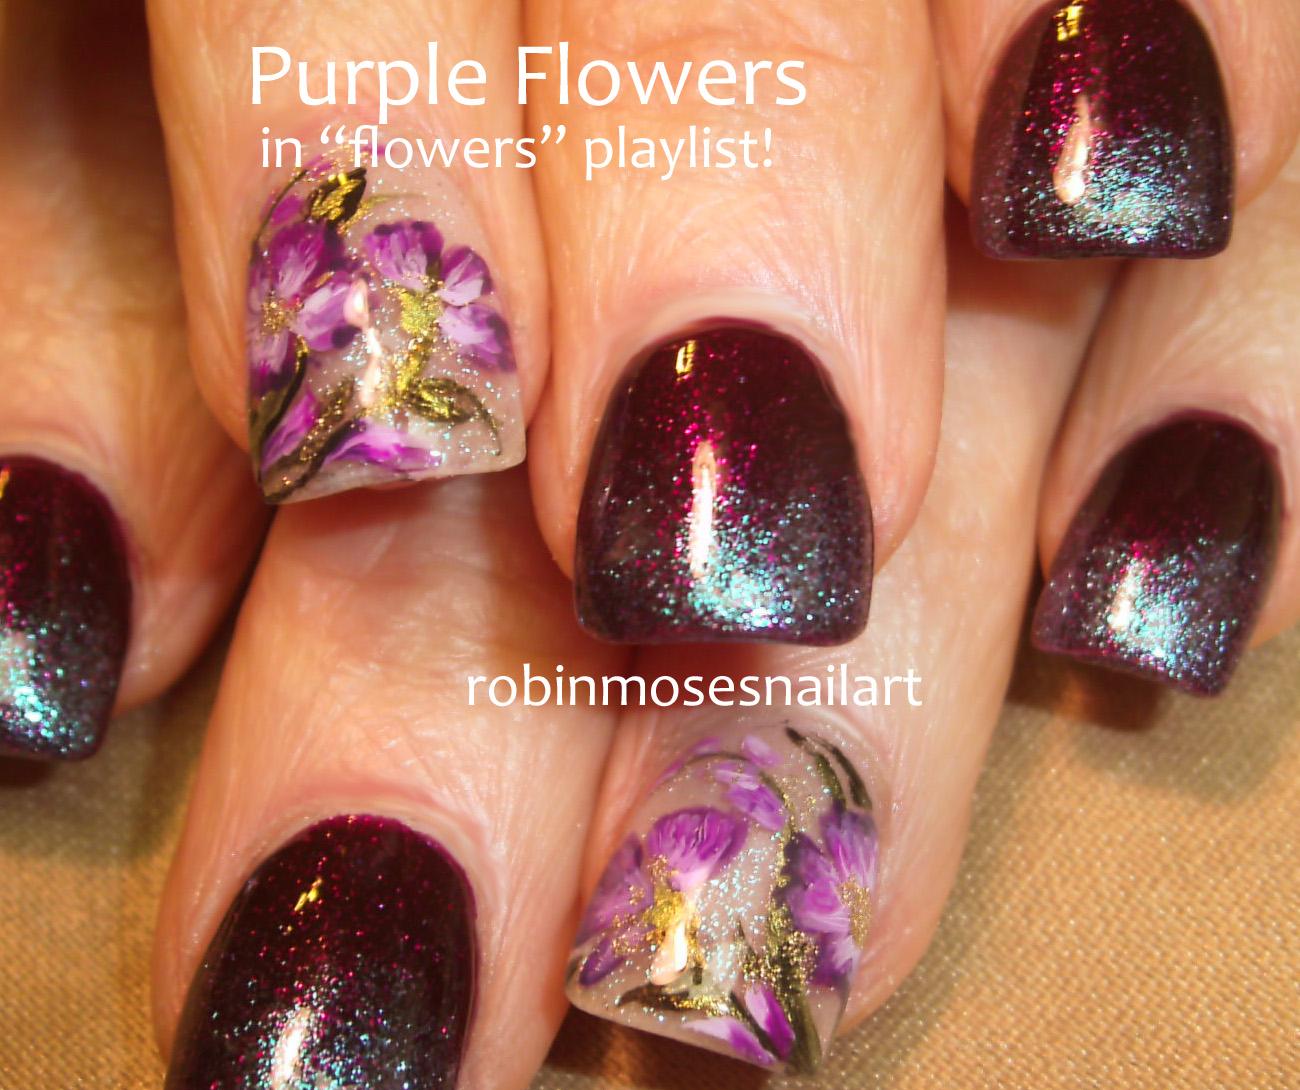 Dark purple nails light purple nails mauve nail art mauve nails dark purple nails light purple nails mauve nail art mauve nails easy nail art purple flower nails easy purple nails simple purple nails easy prom prinsesfo Gallery